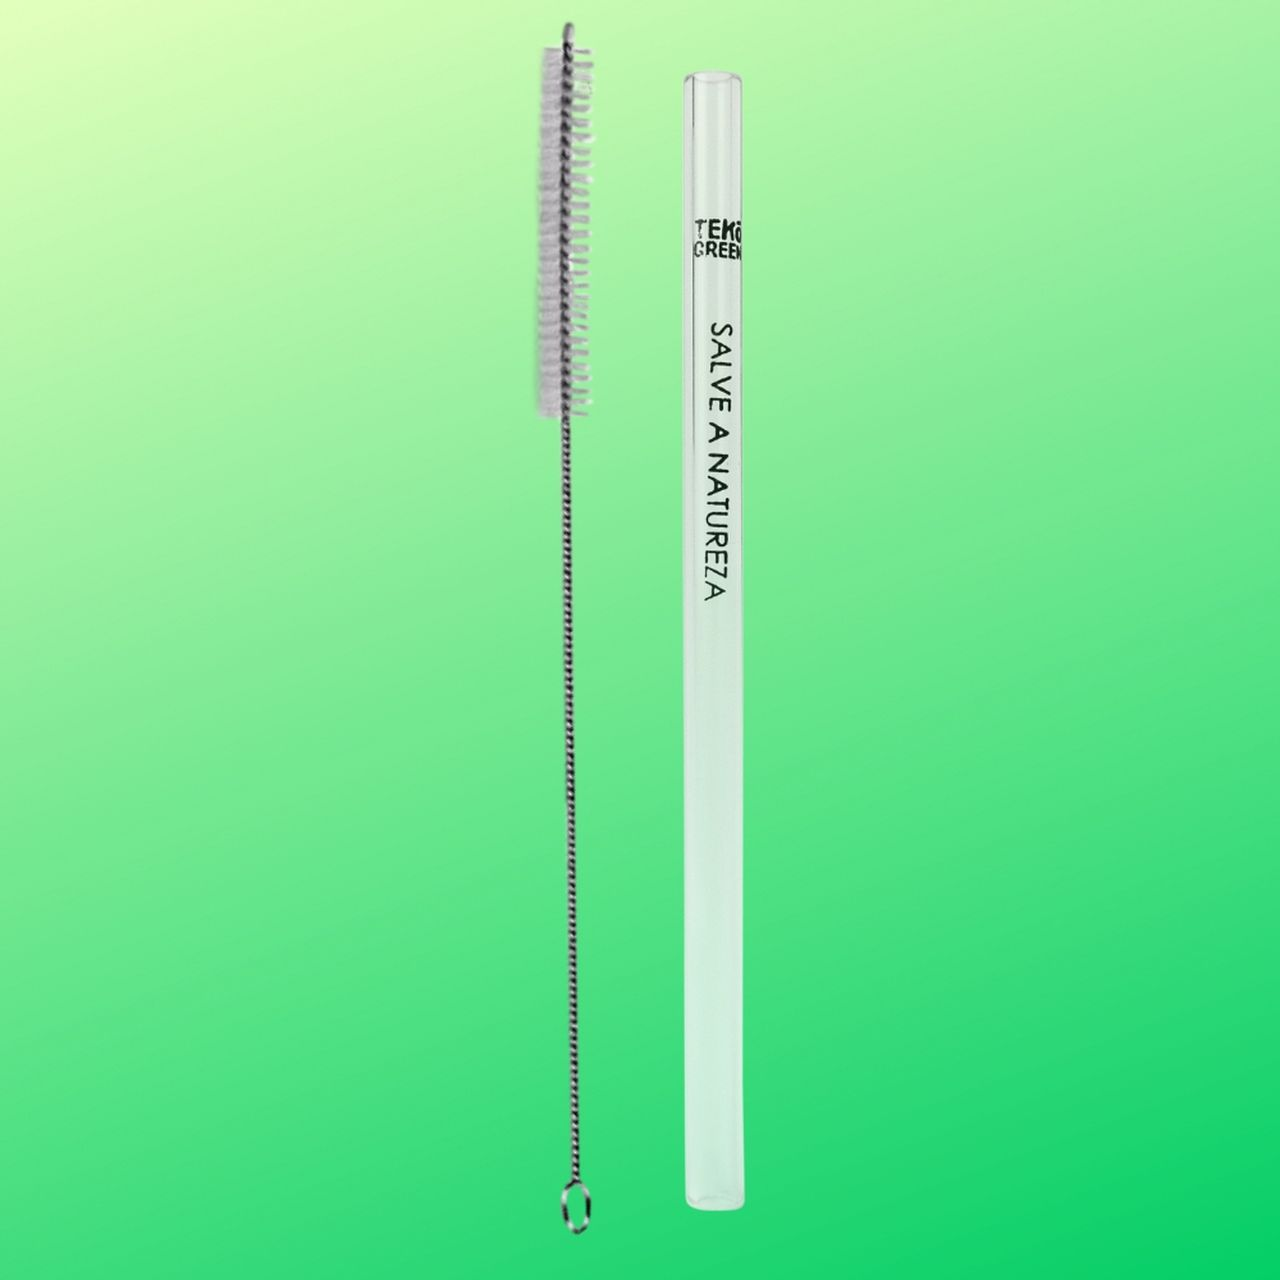 Kit Canudo Ecológico Tekógreen - Ø12 mm X 23cm + Escova Higiênica